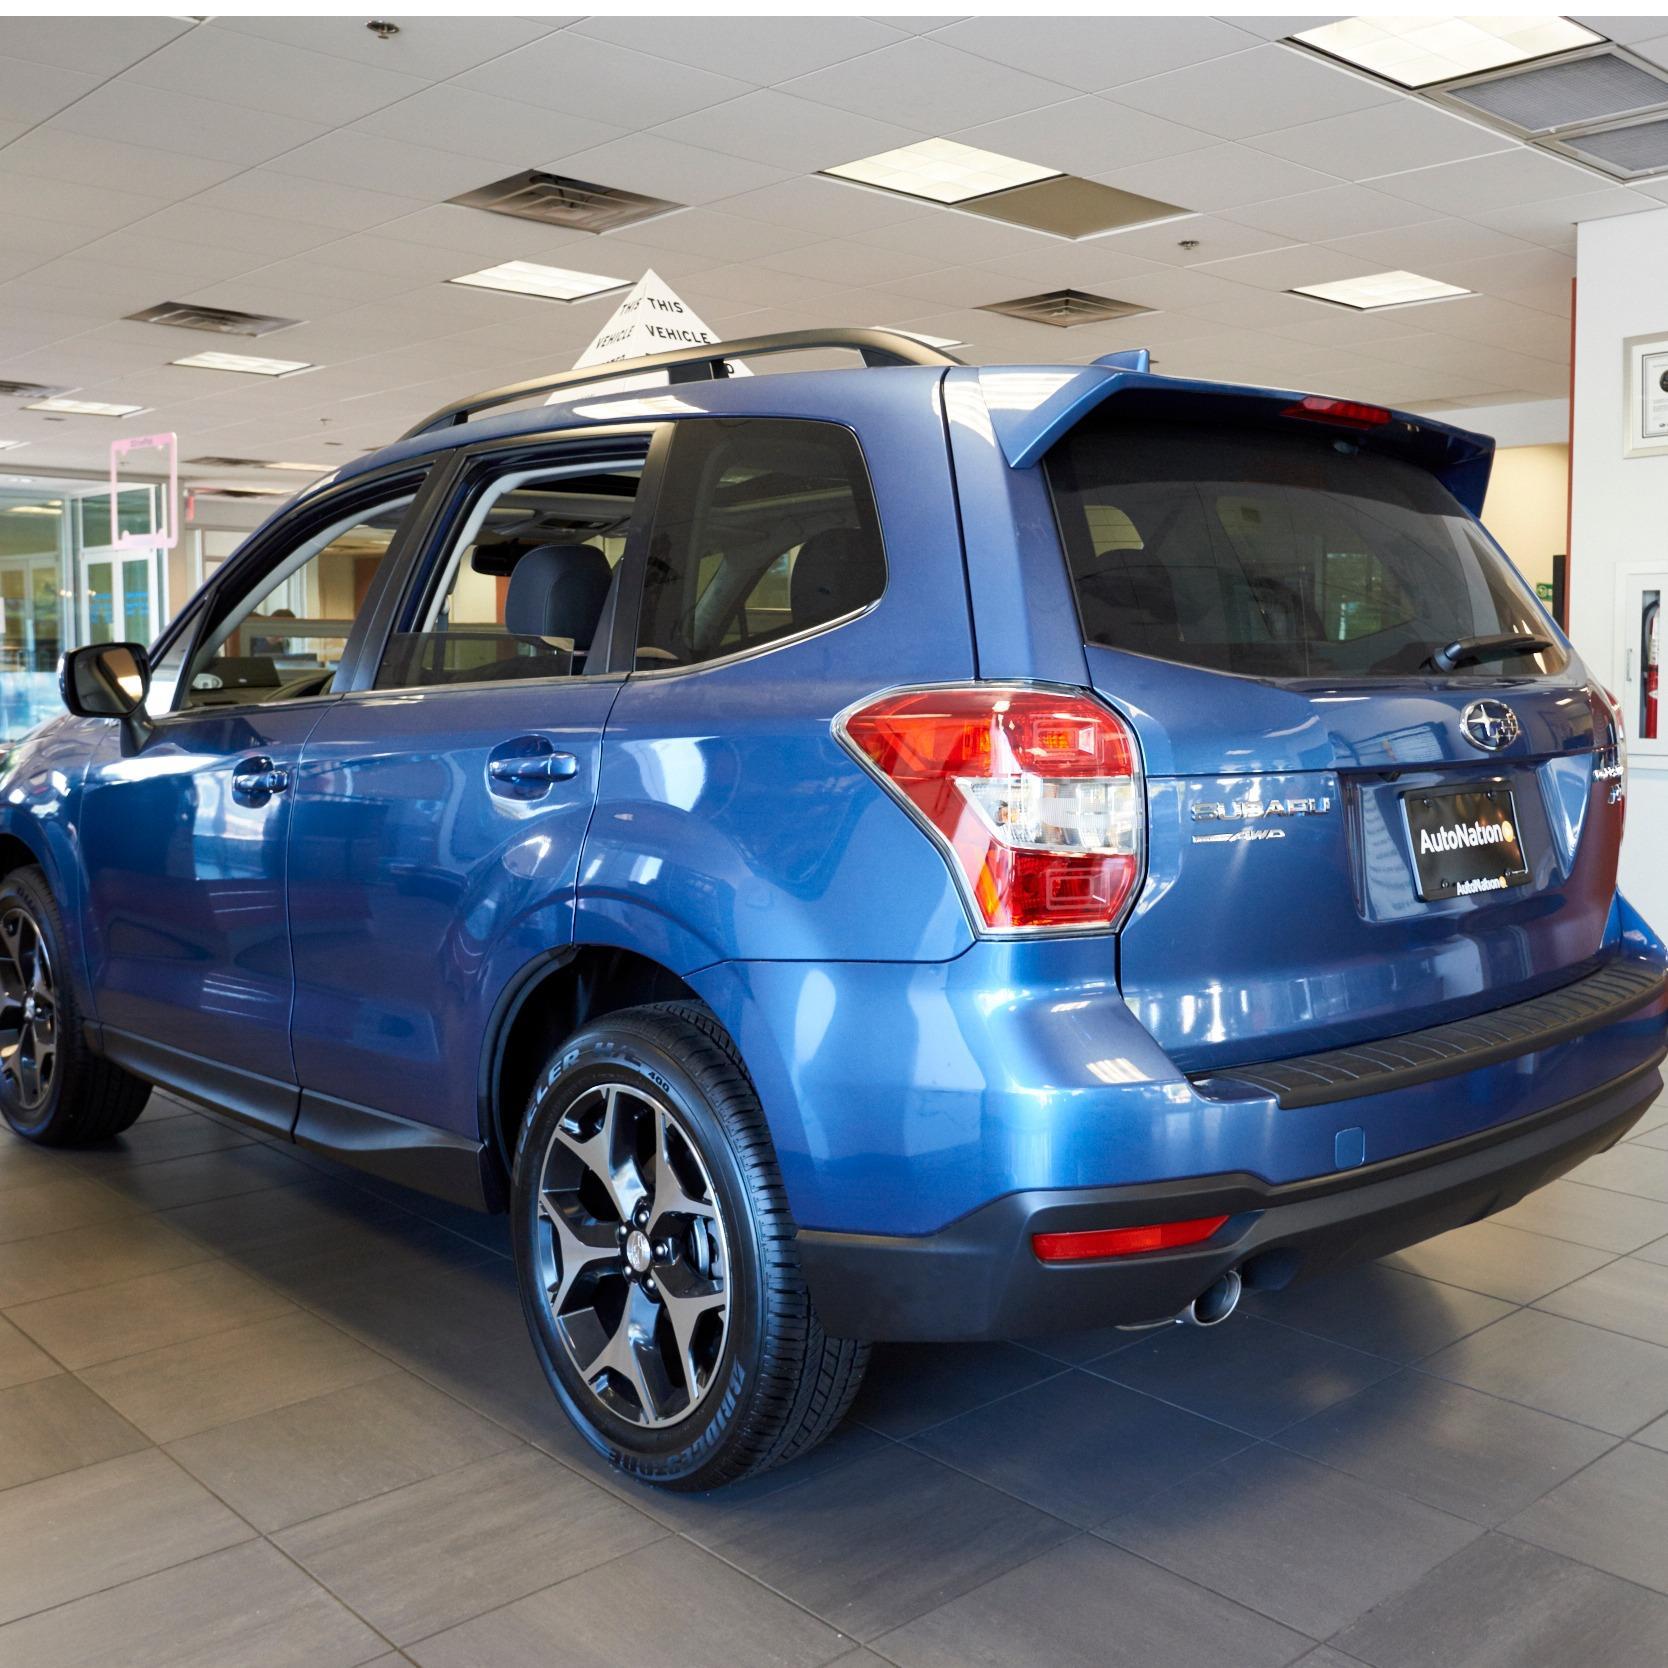 AutoNation Subaru Scottsdale image 0